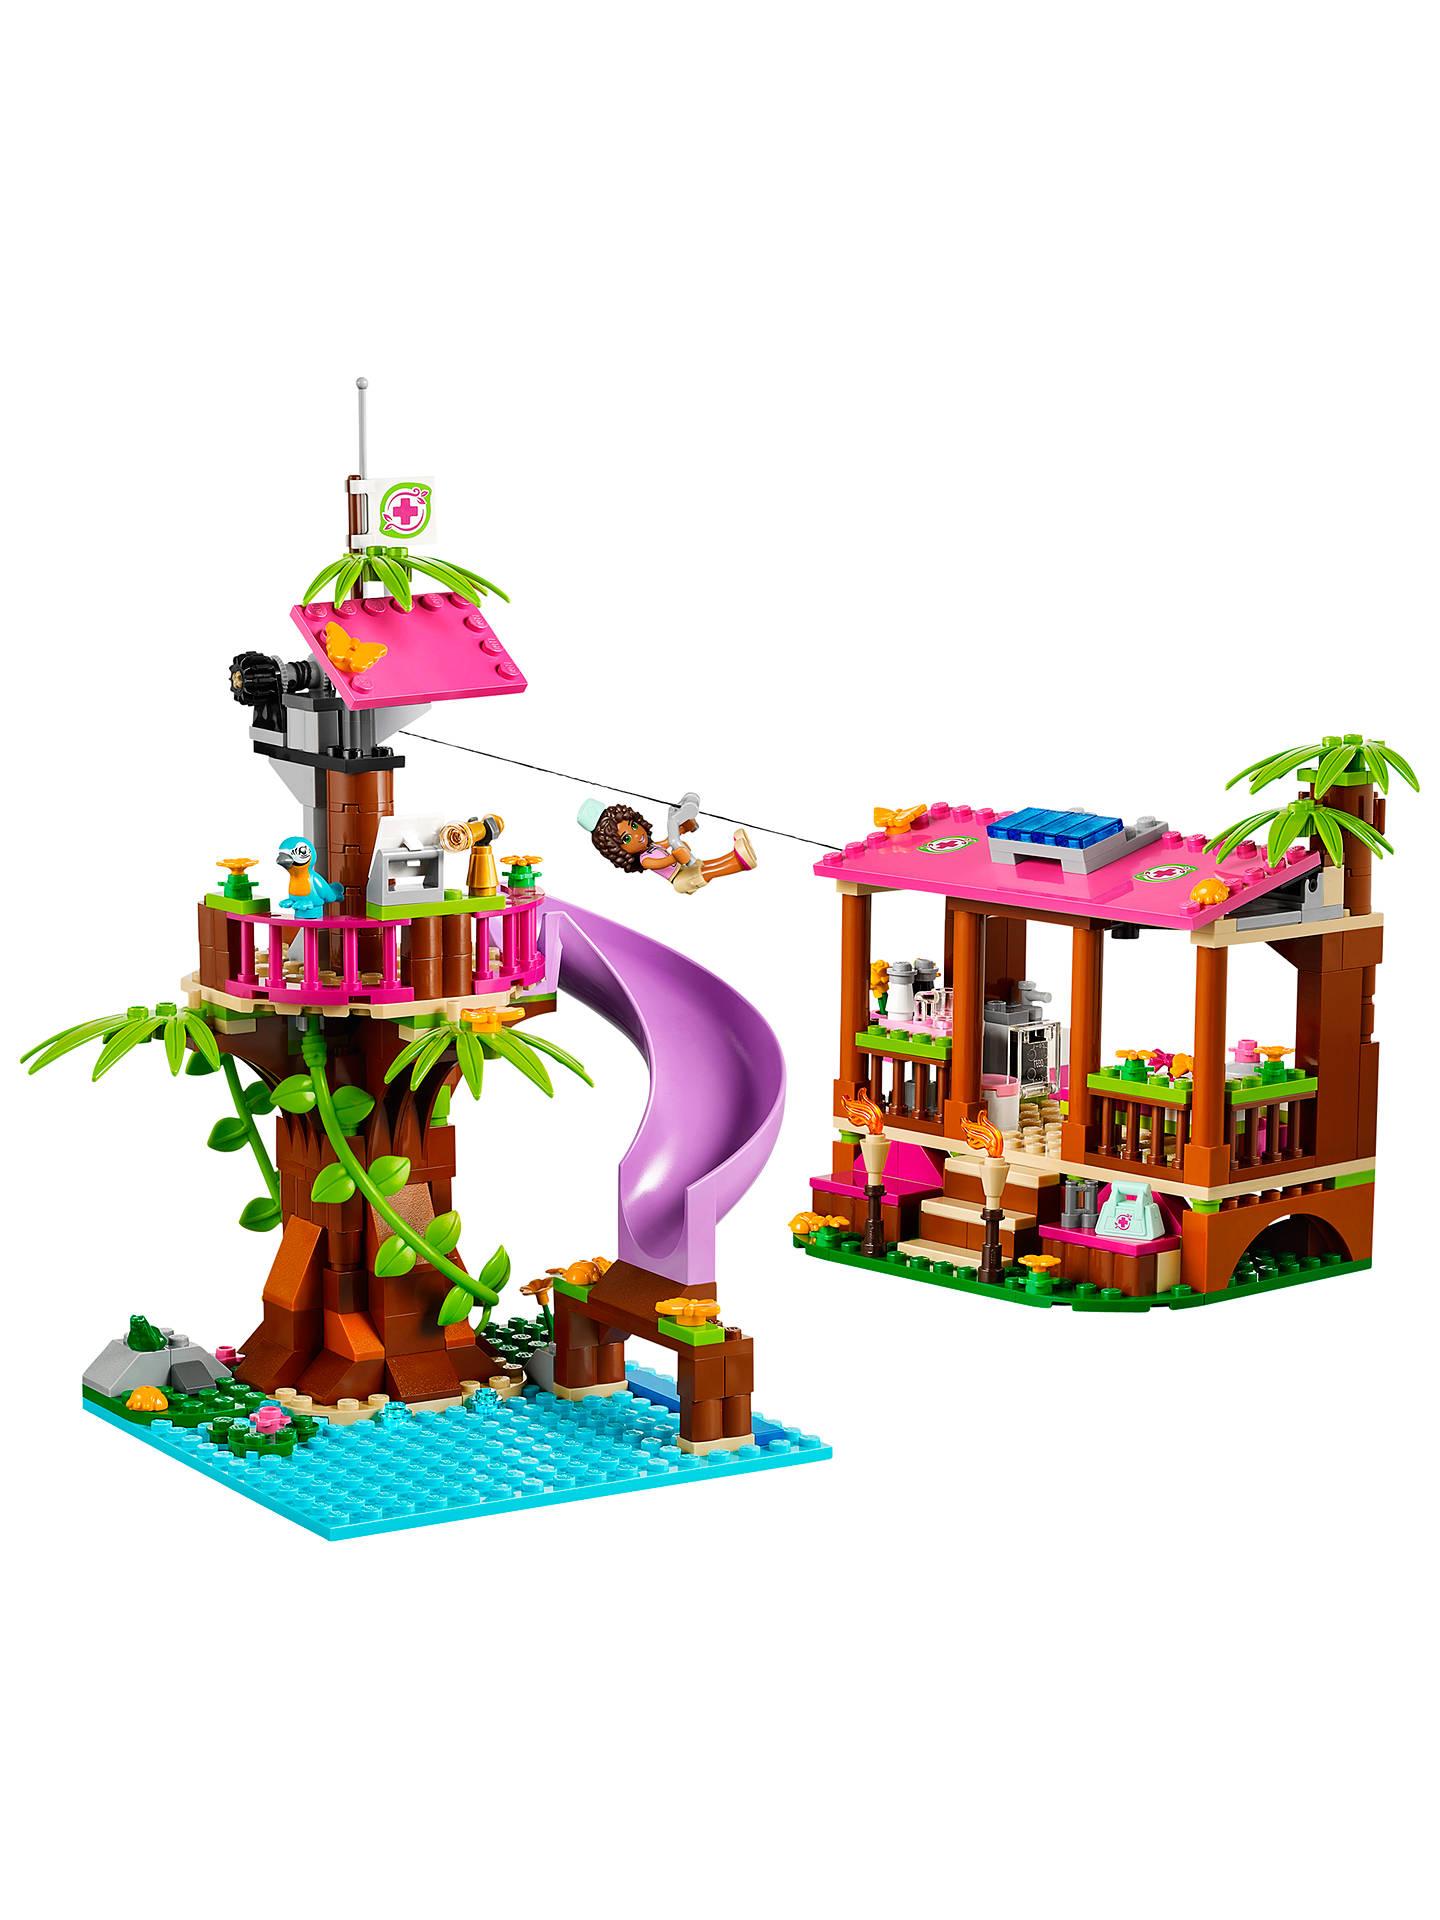 LEGO Friends Jungle Rescue Base at John Lewis & Partners